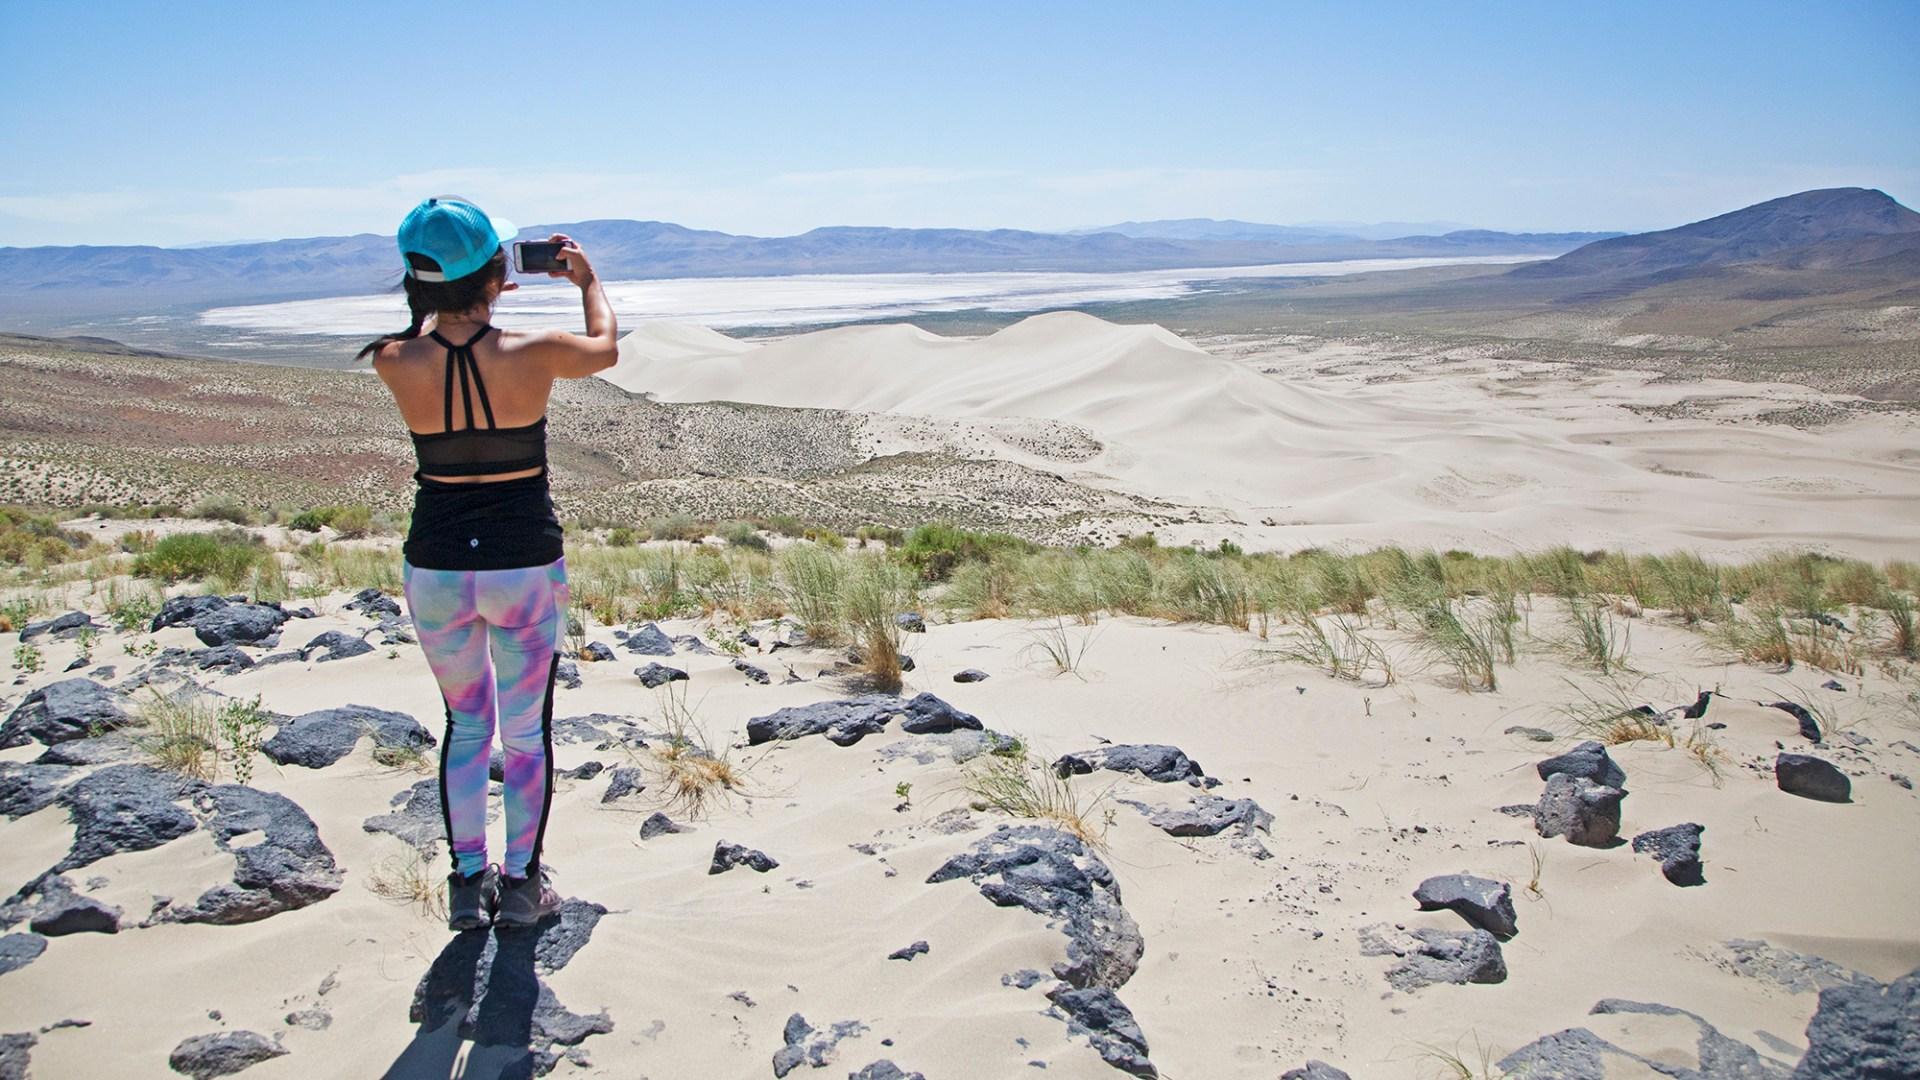 Image: Sand Mountain Recreation Area, courtesy of Travel Nevada.